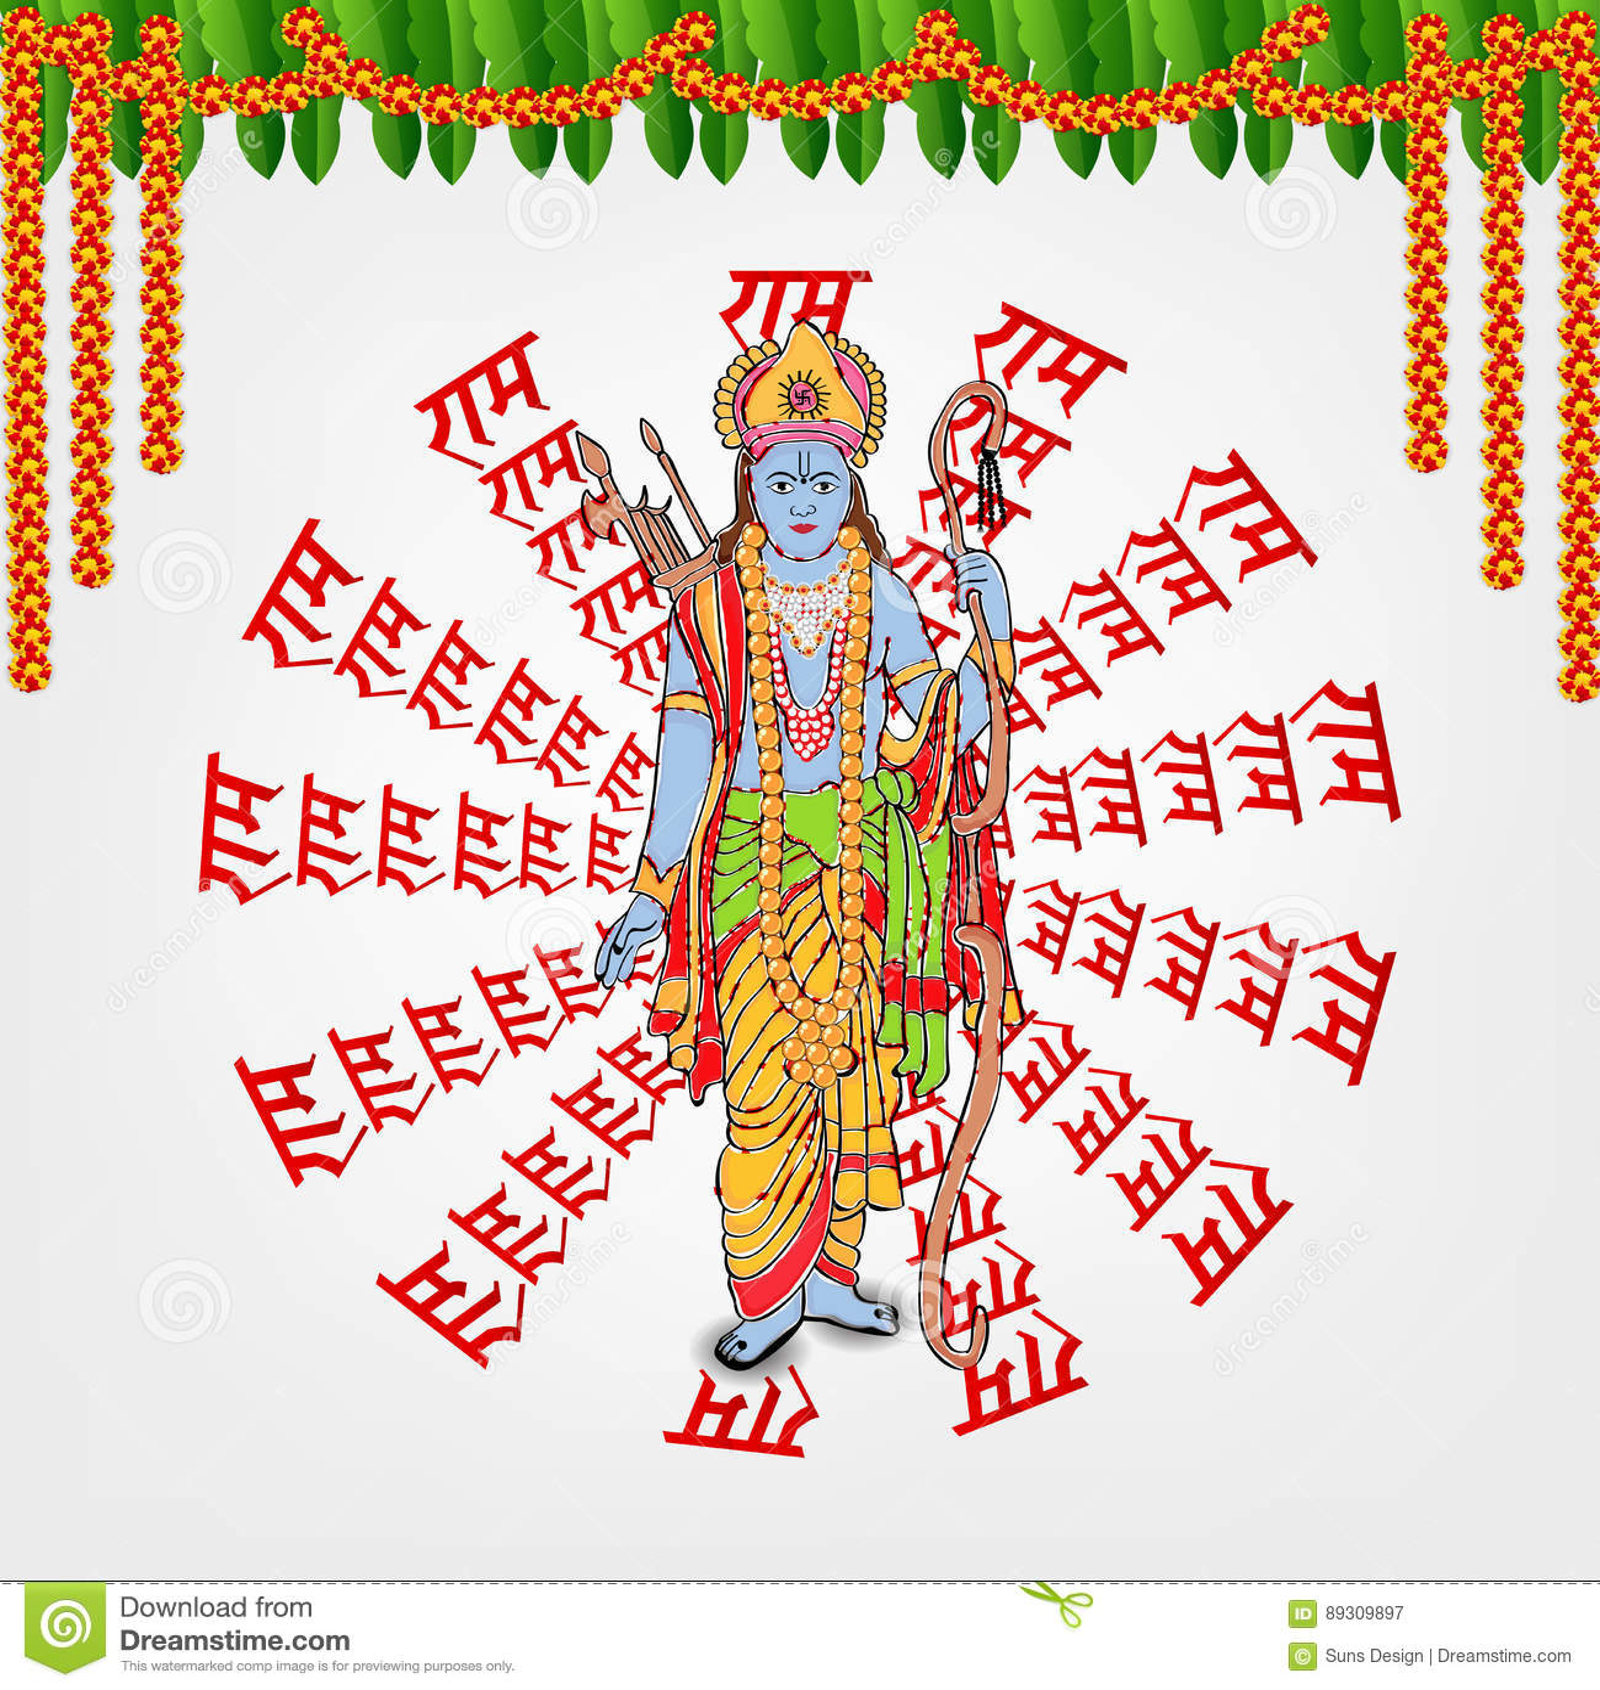 Sita cartoons illustrations vector stock images 169 for Jai shree ram tattoo in hindi